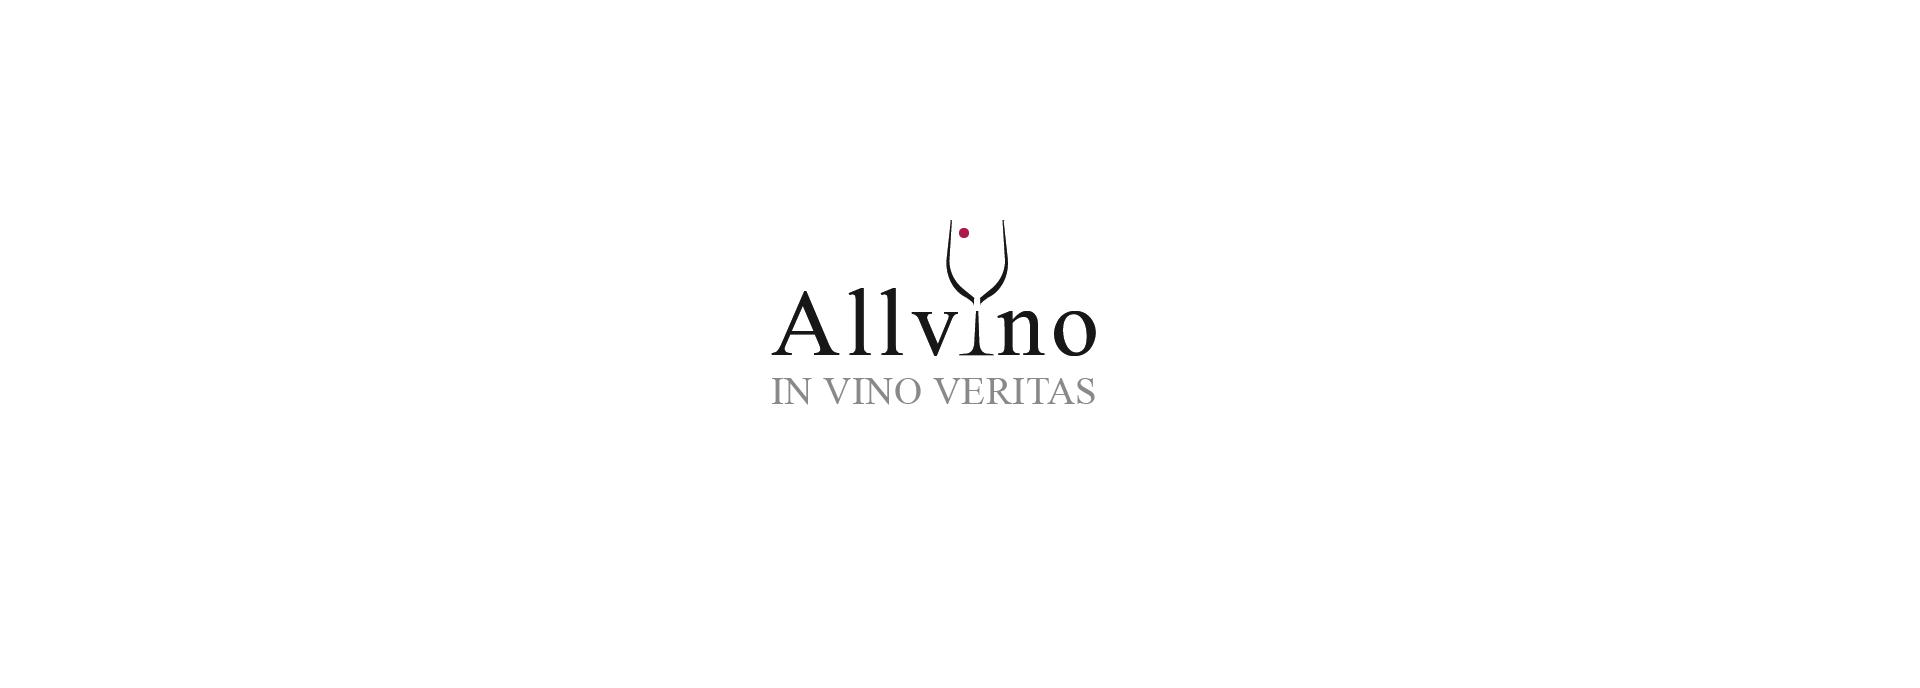 Allvino